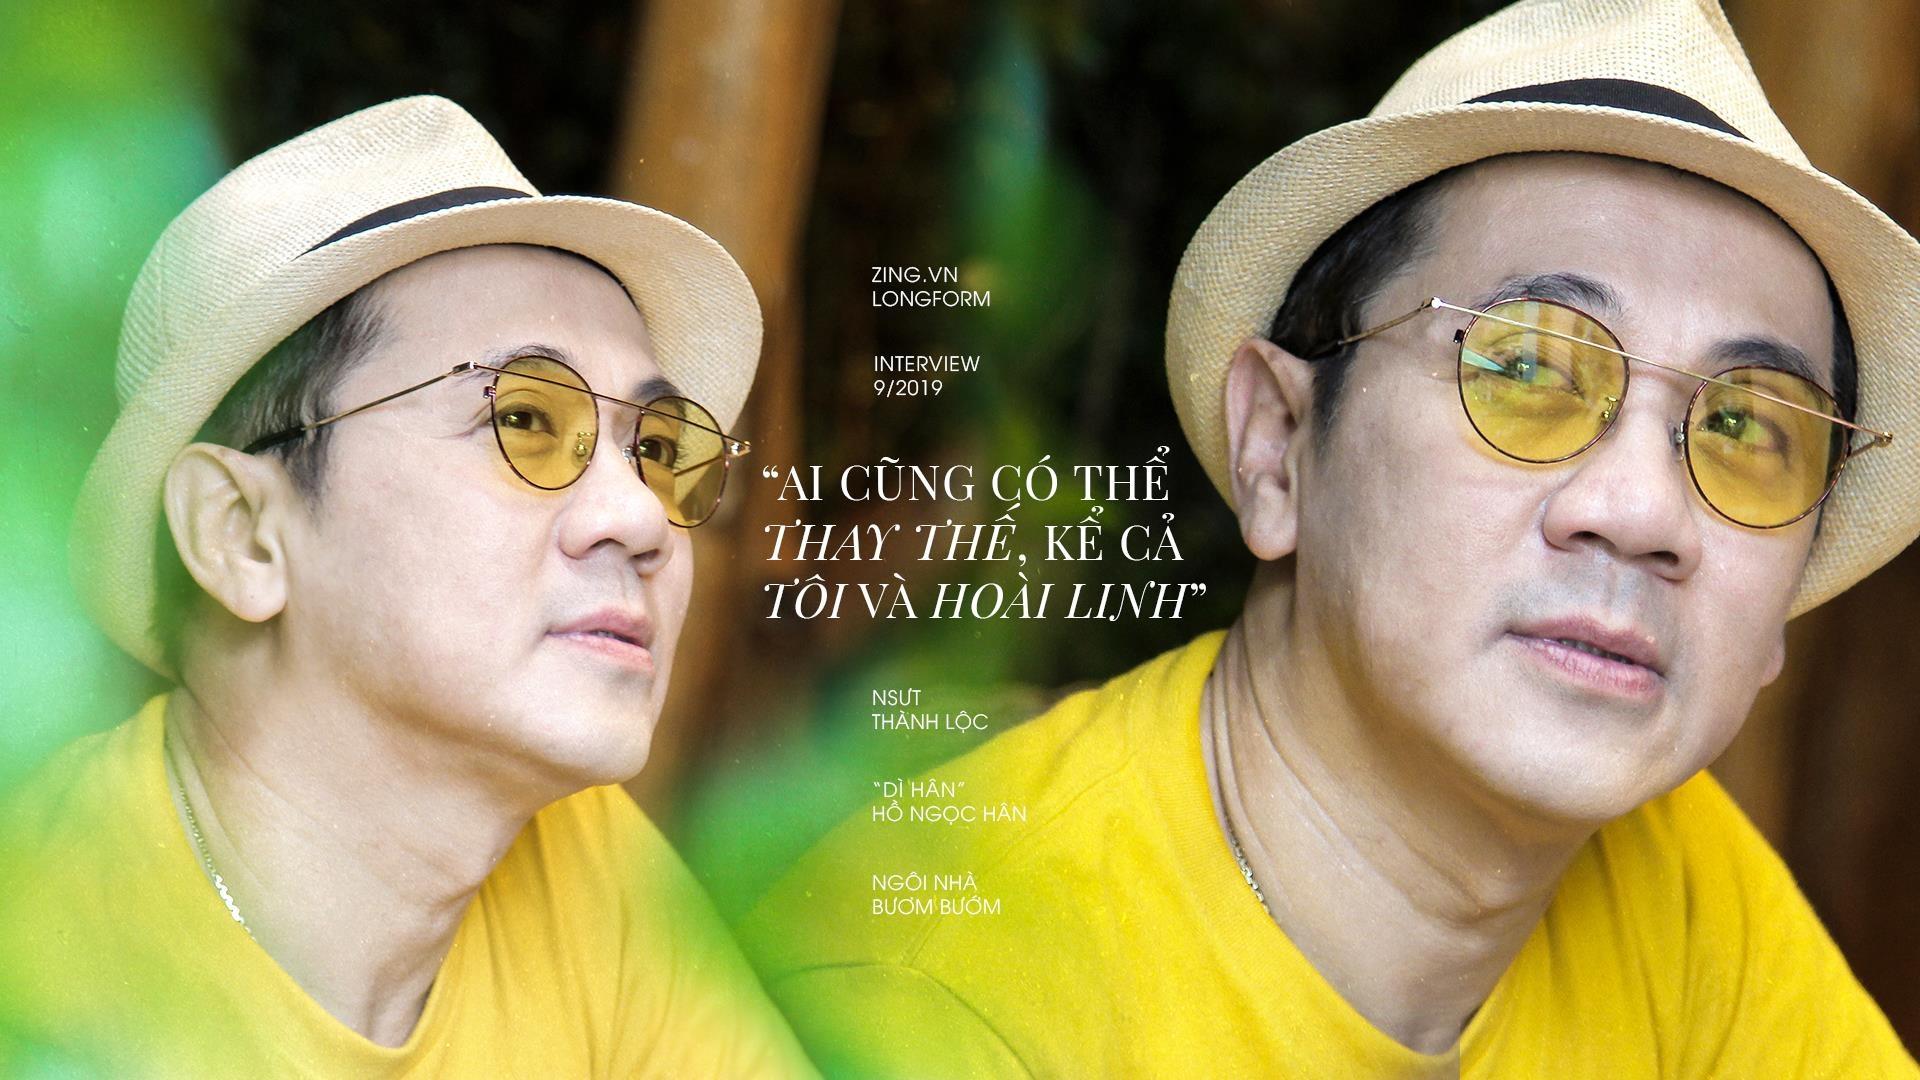 Nghe si Thanh Loc: 'Ai cung co the thay the, ke ca toi va Hoai Linh' hinh anh 2